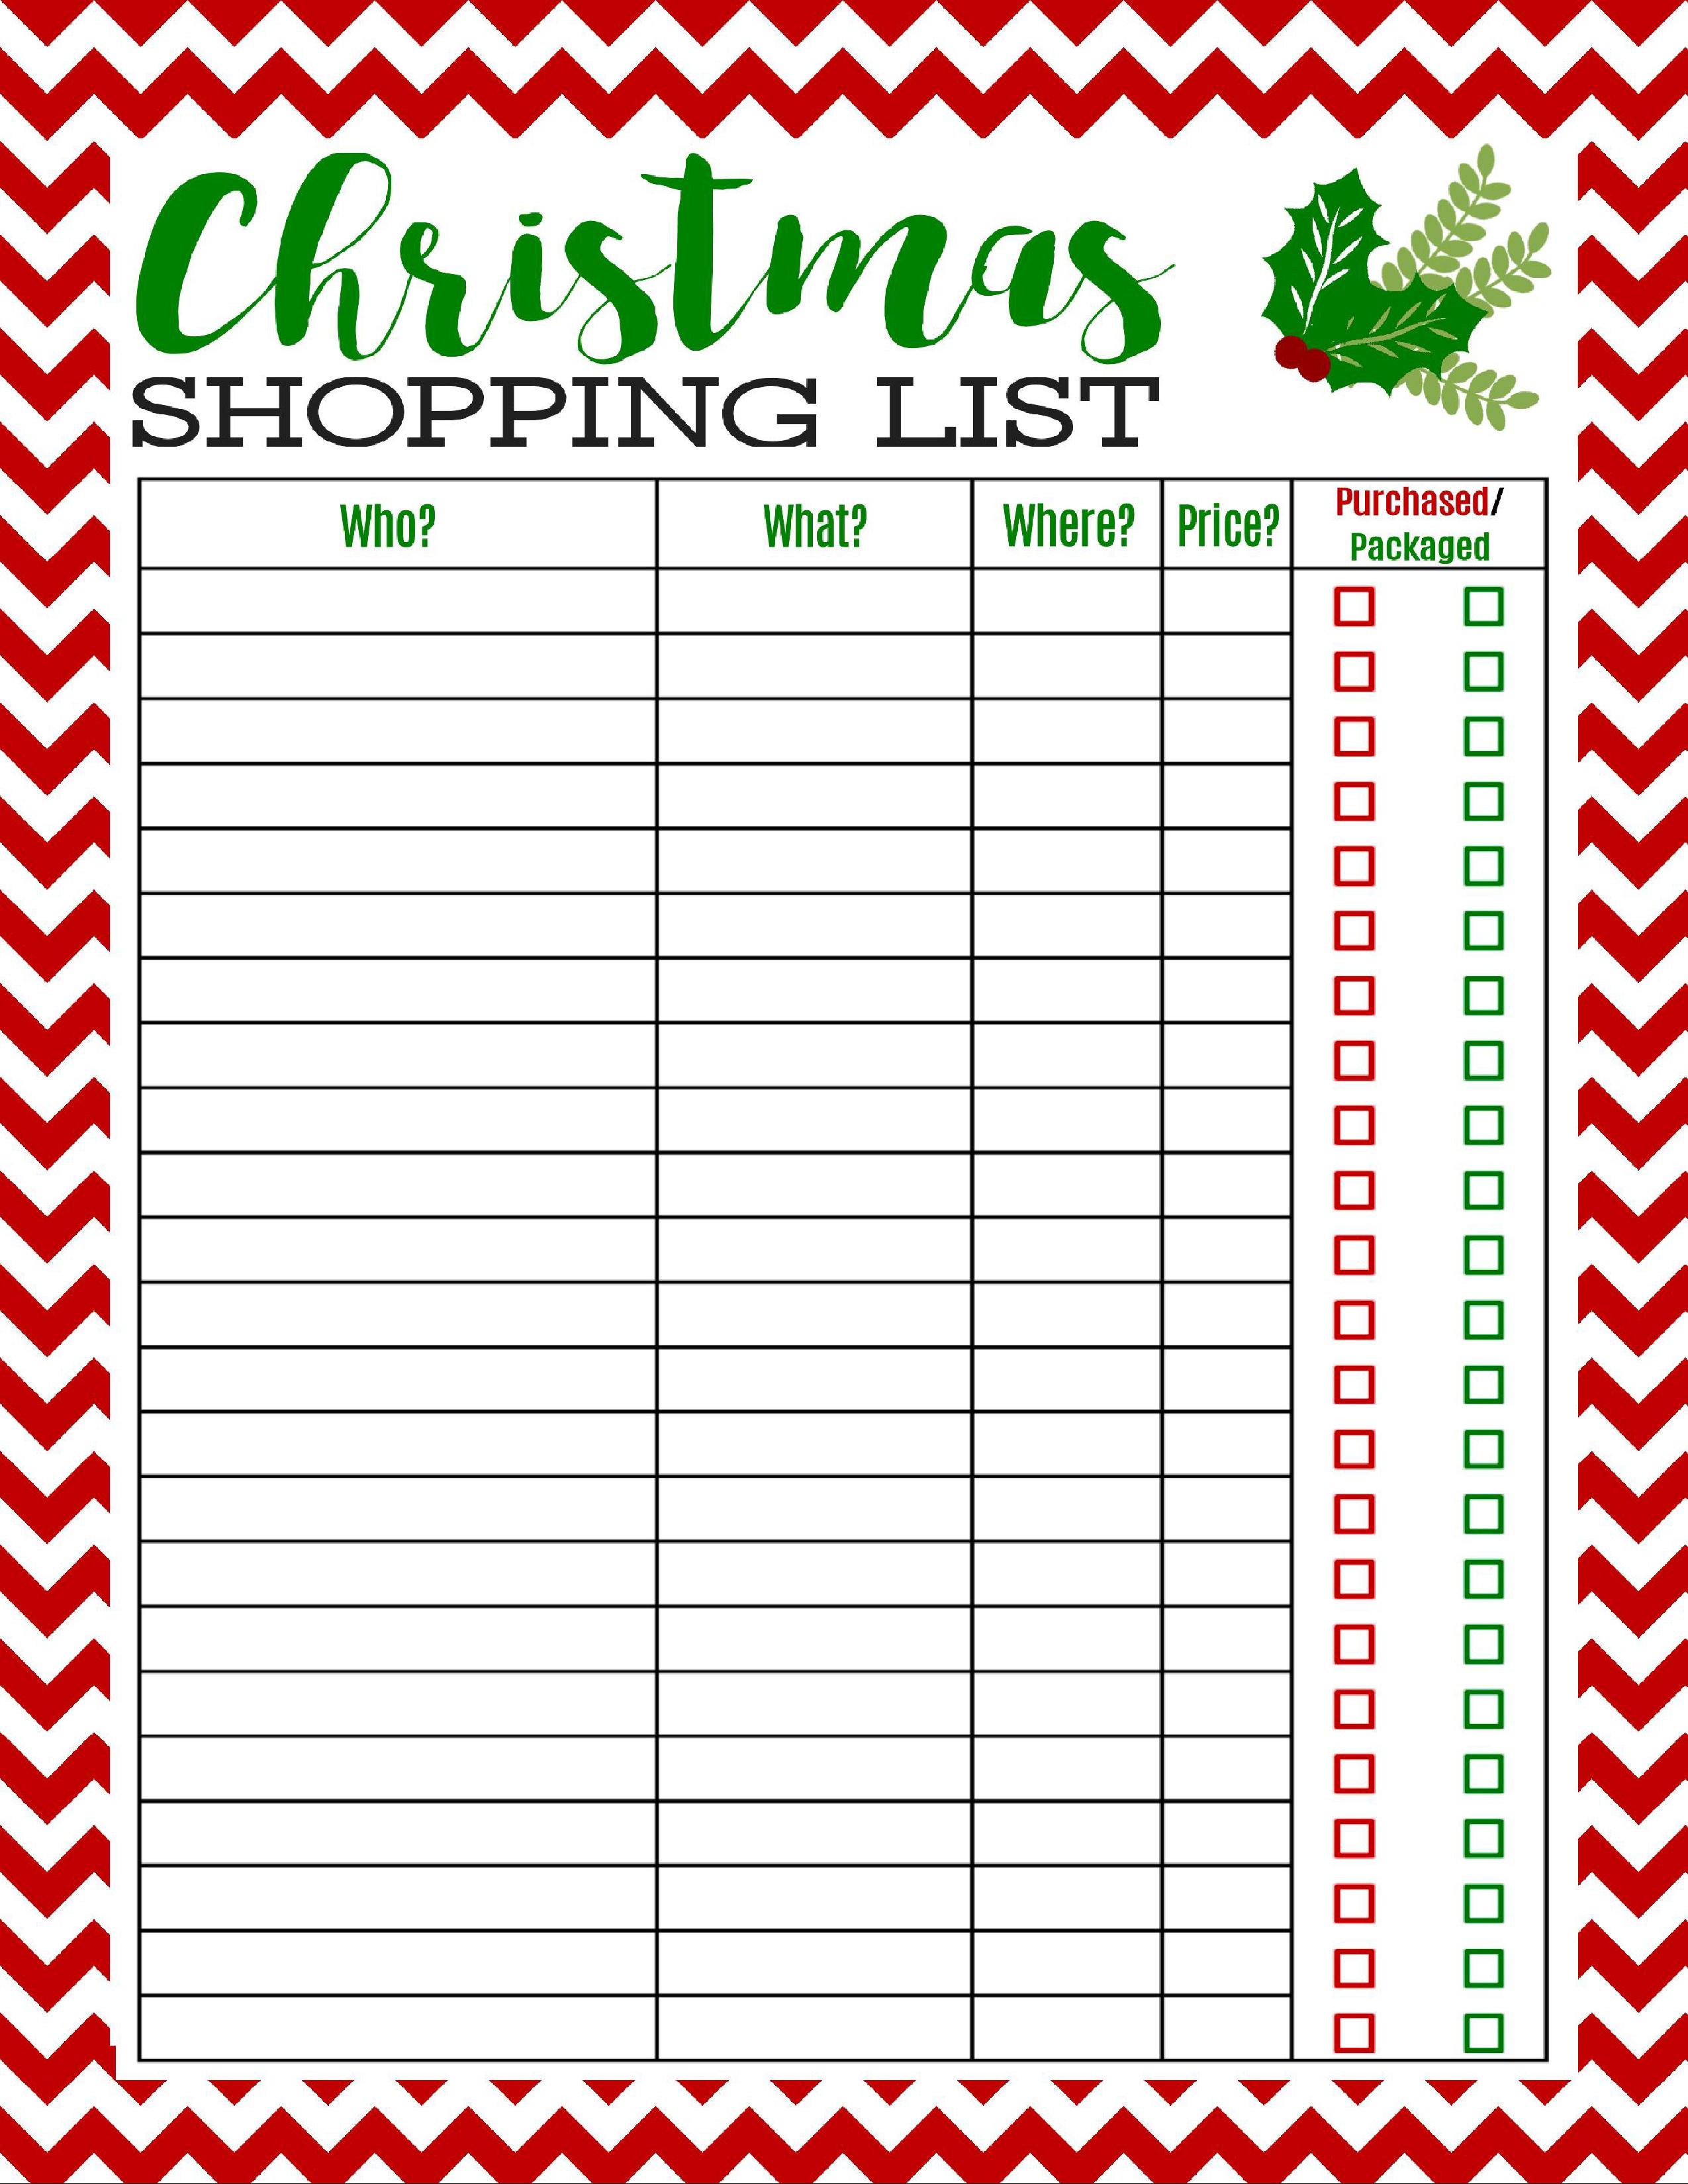 Freebie Printable Christmas Shopping List | Best Of Pinterest - Free Printable Christmas Wish List